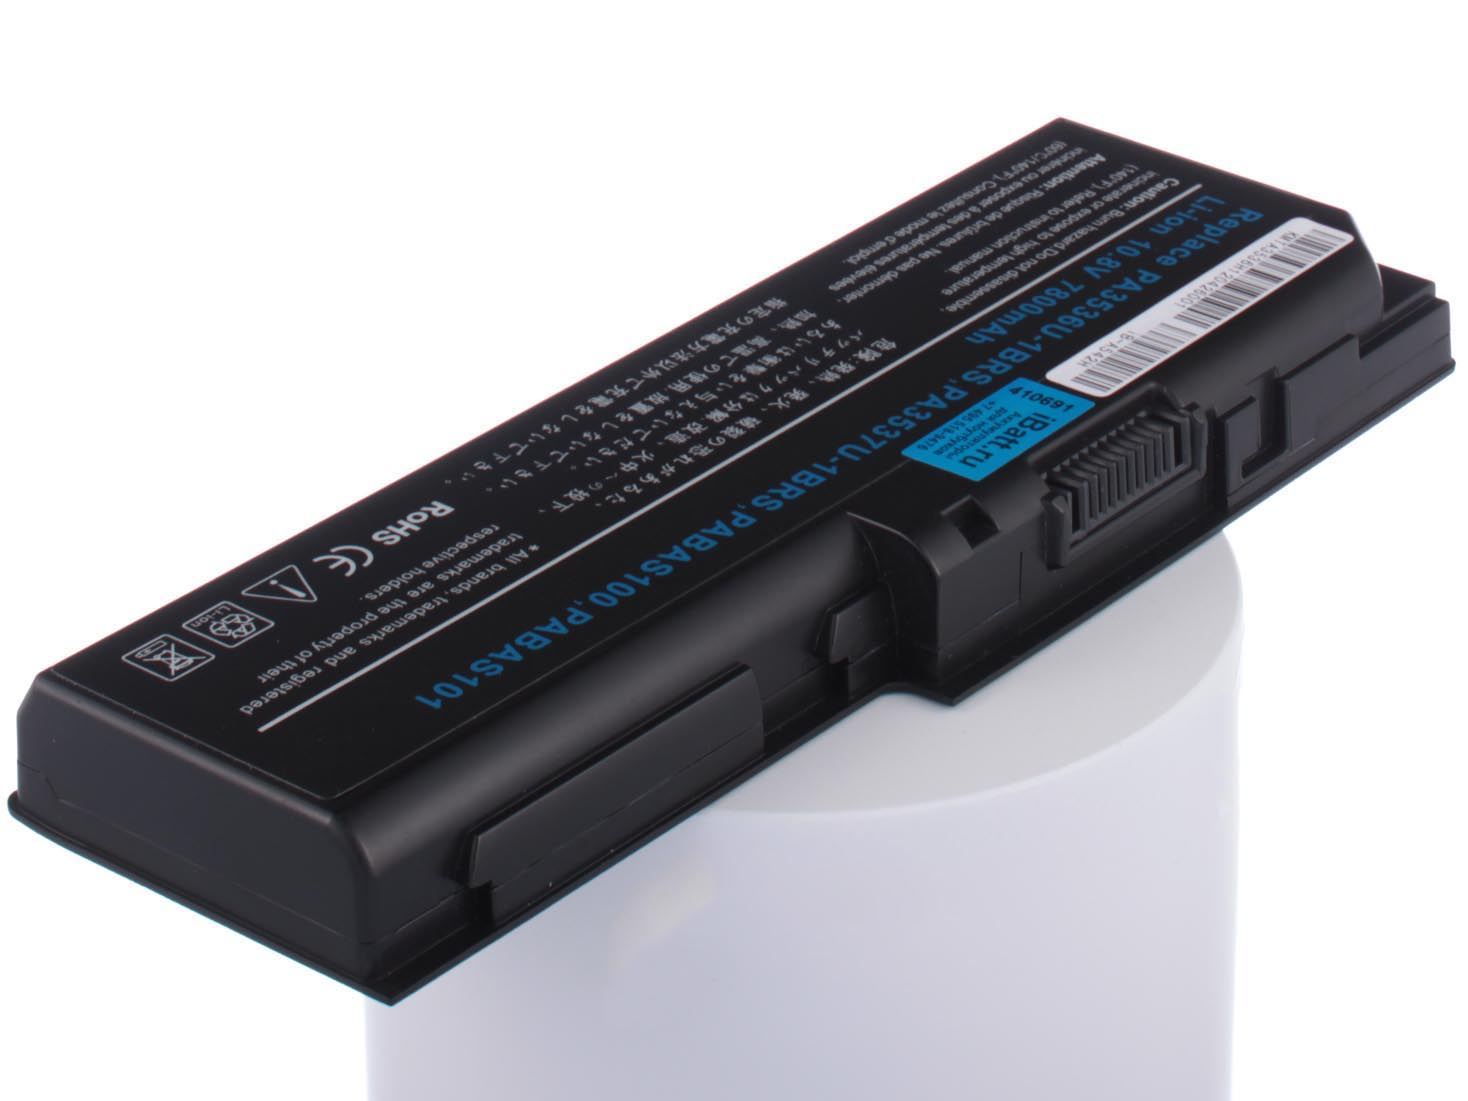 Аккумулятор для ноутбука iBatt для ToshiBa Satellite X200-251, Satellite L350-170, Satellite L350D-12Q, Satellite P200-10C, Satellite P205D-S7438, Satellite Pro P300, Satellite X200-21T, Equium P300, Satellite P200-18Y блок питания palmexx 19v 3 95a для toshiba satellite satellite pro qosmio equium libretto portege tecra dynabook dynabook ss series pa 088